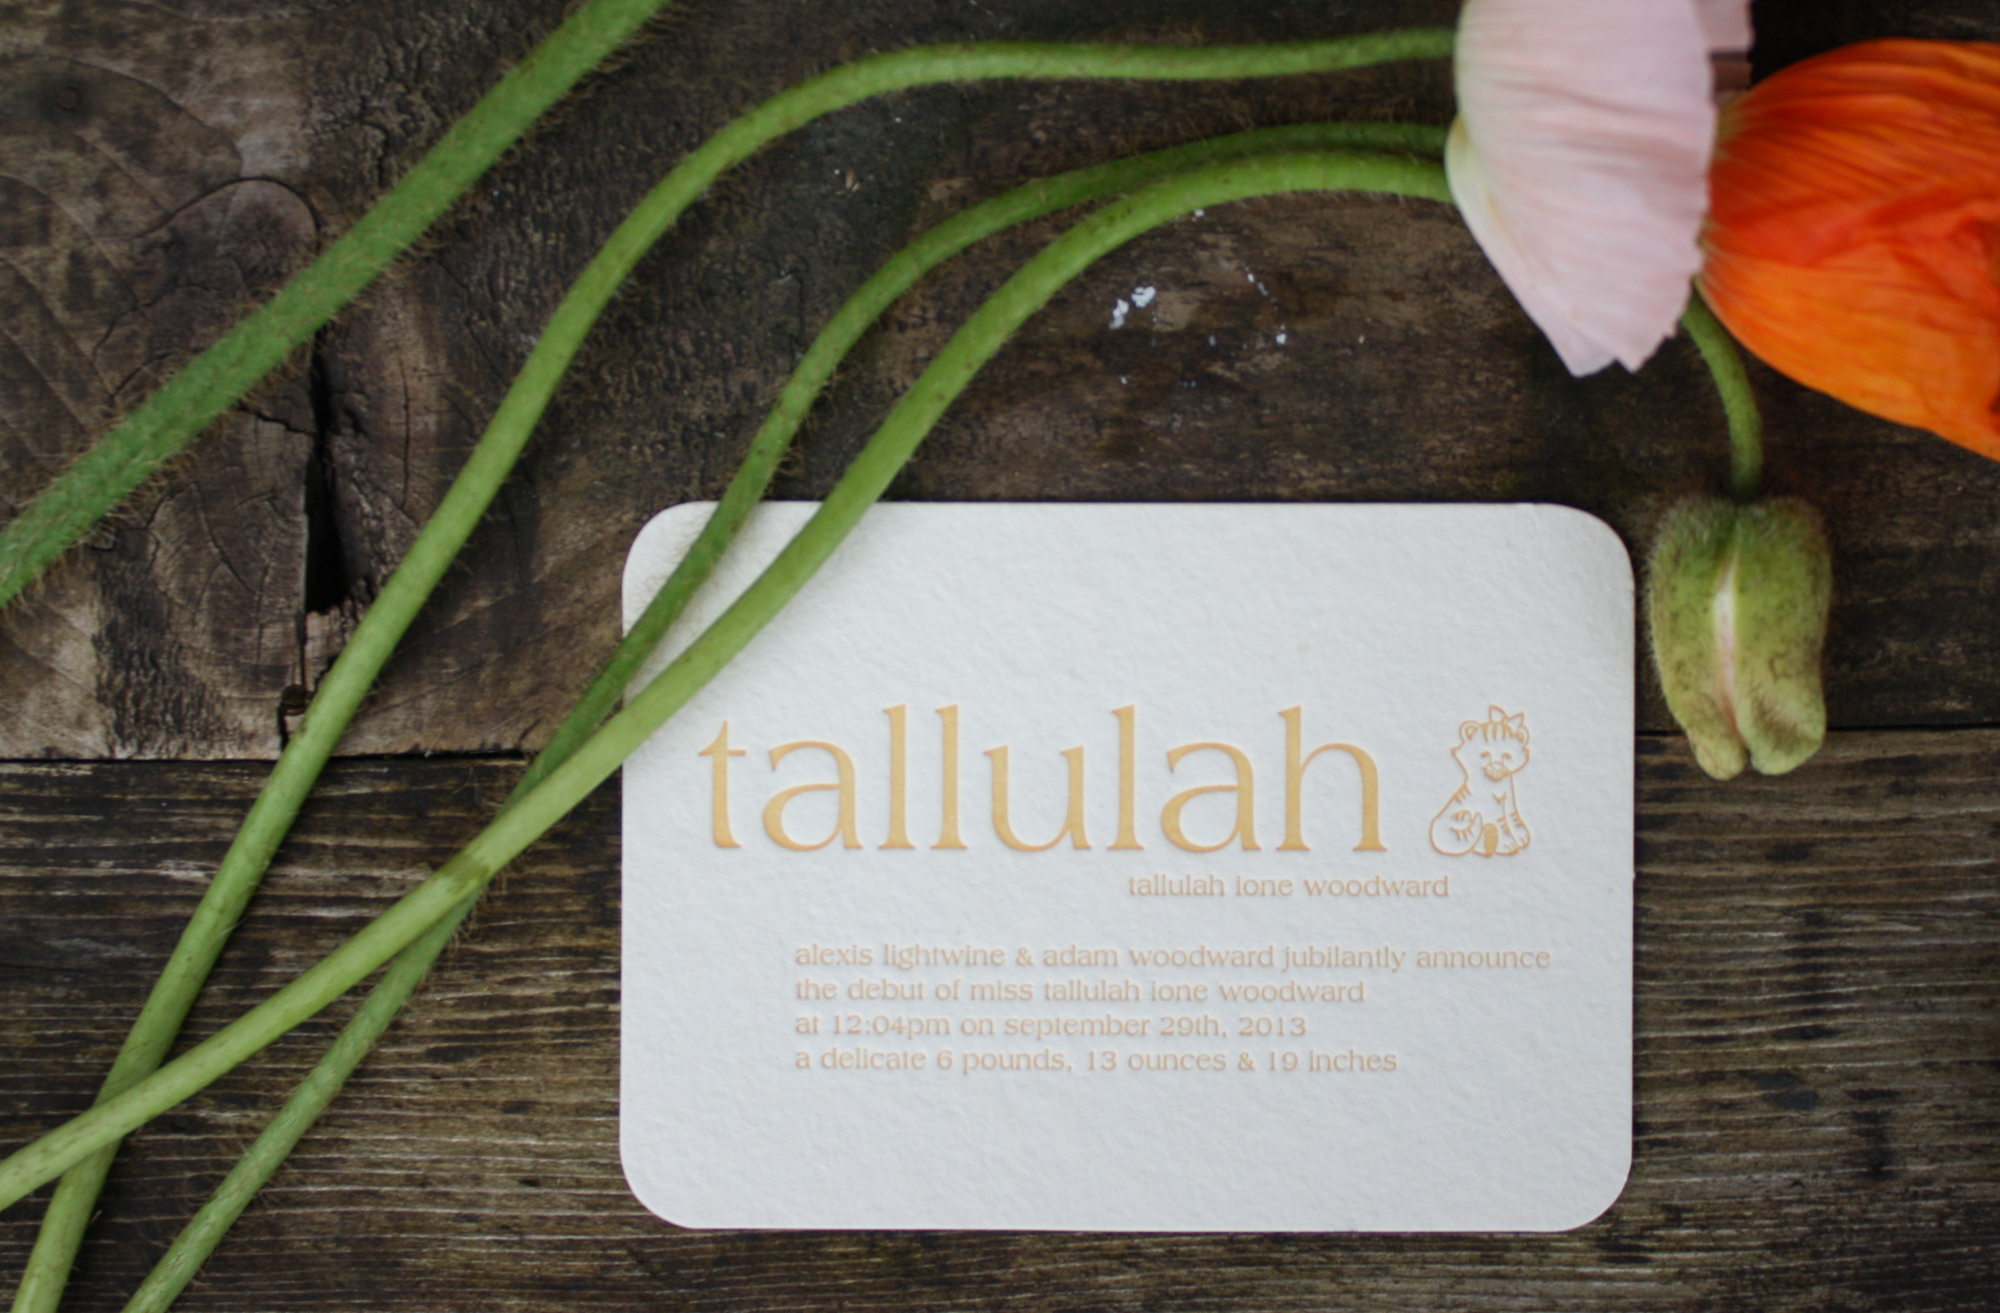 The Tallulah Announcement